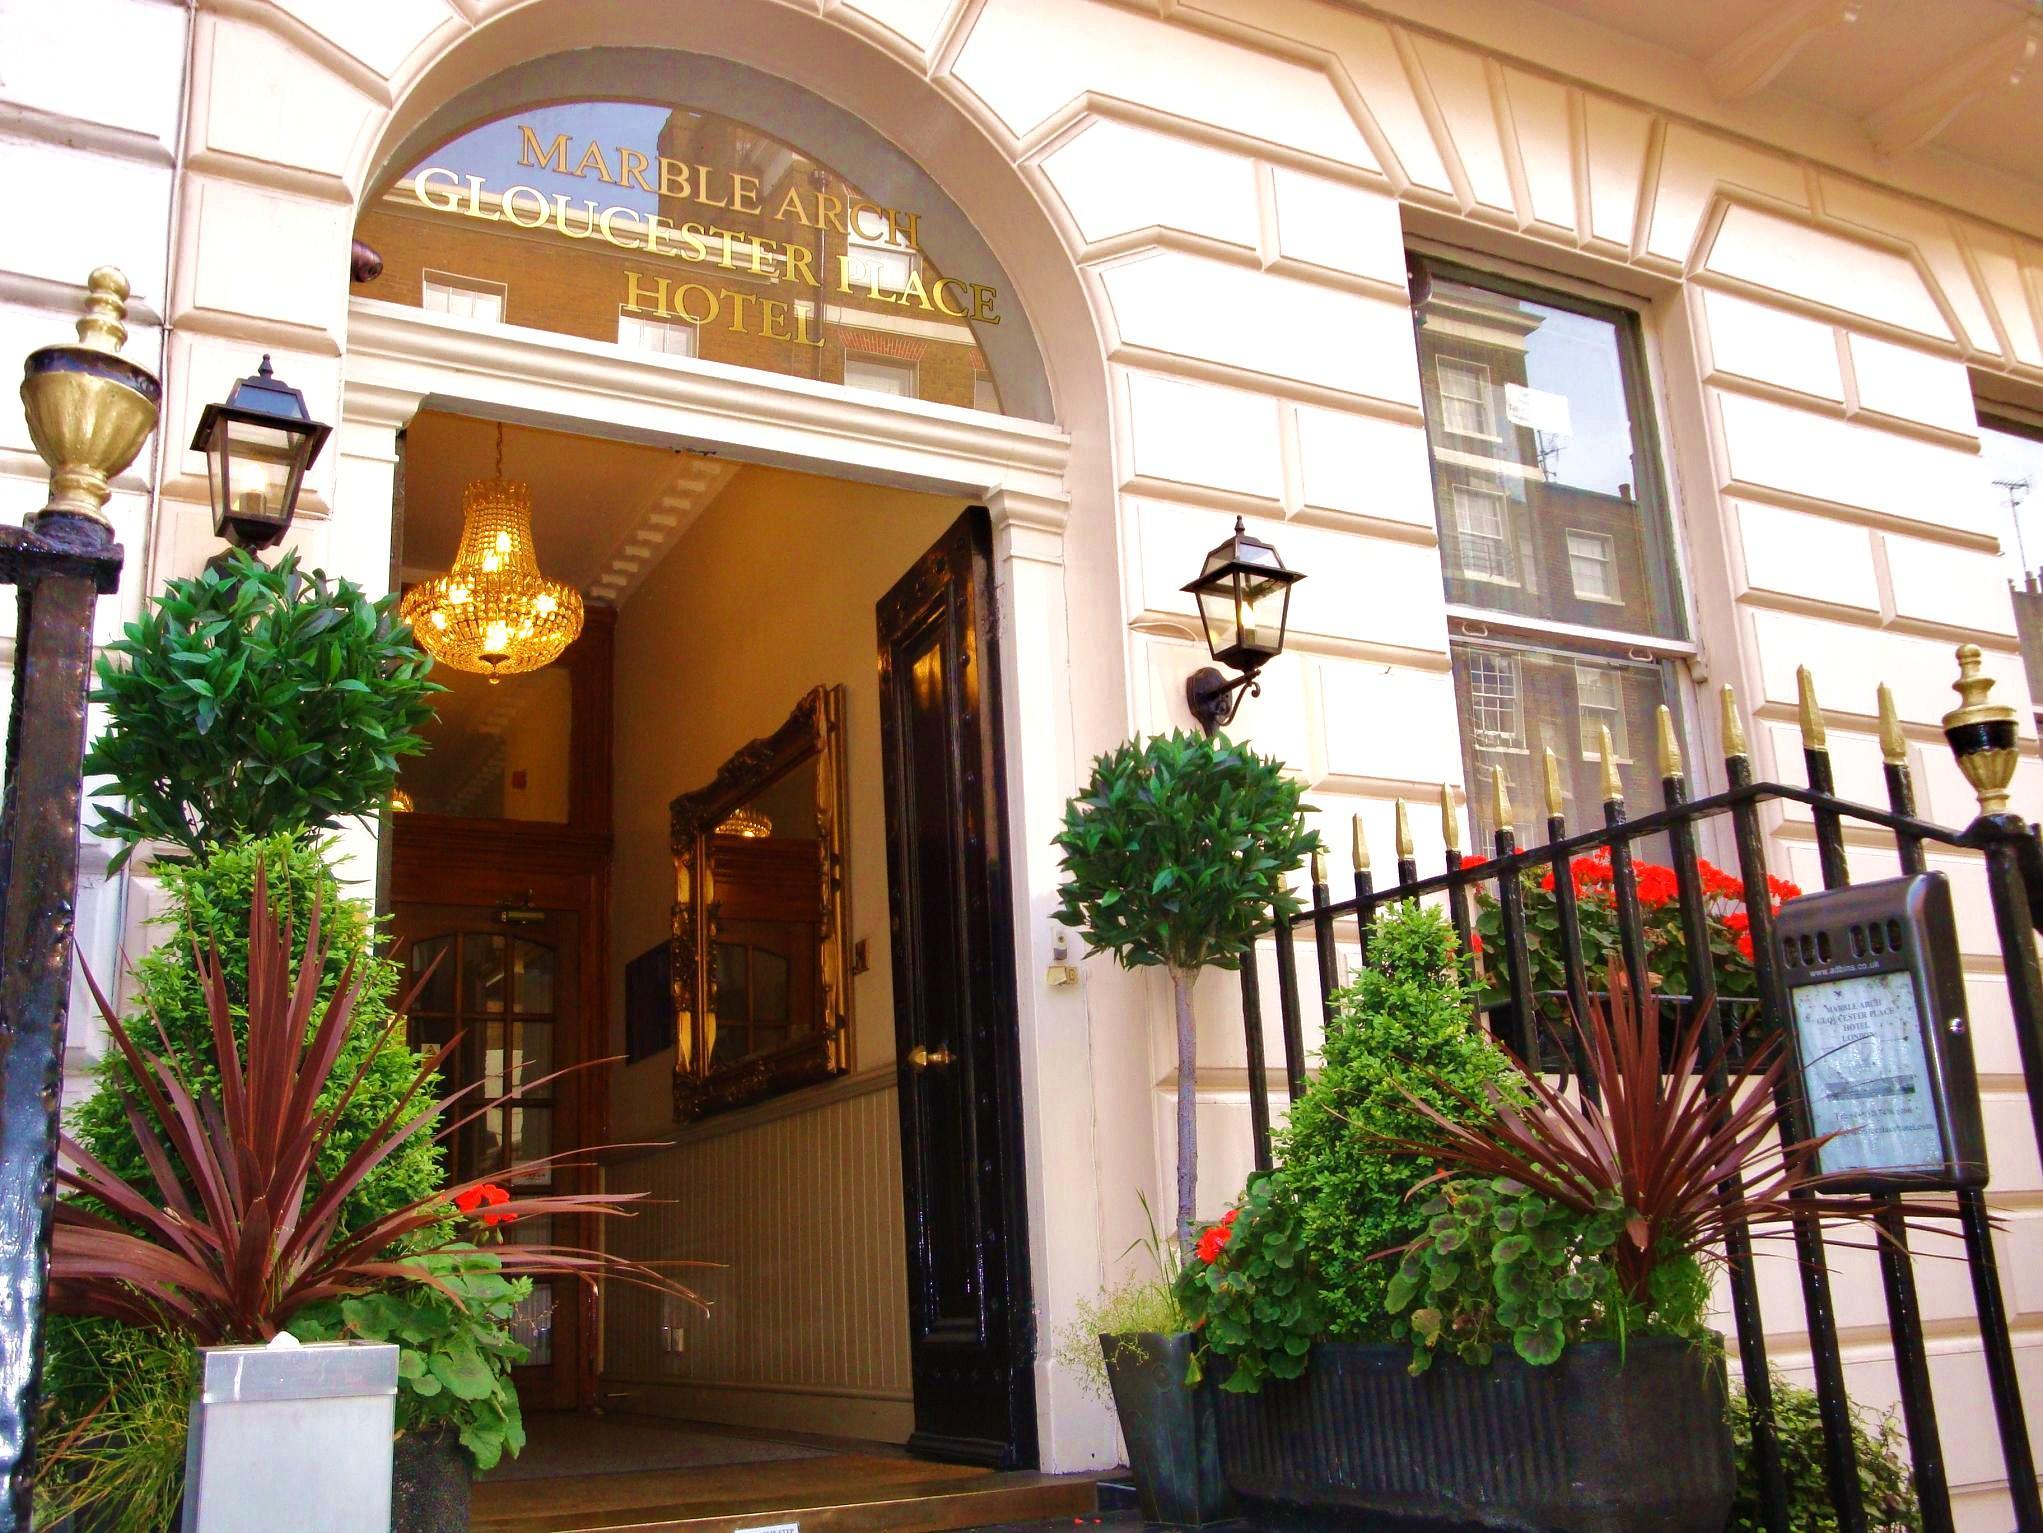 Gloucester Place Hotel